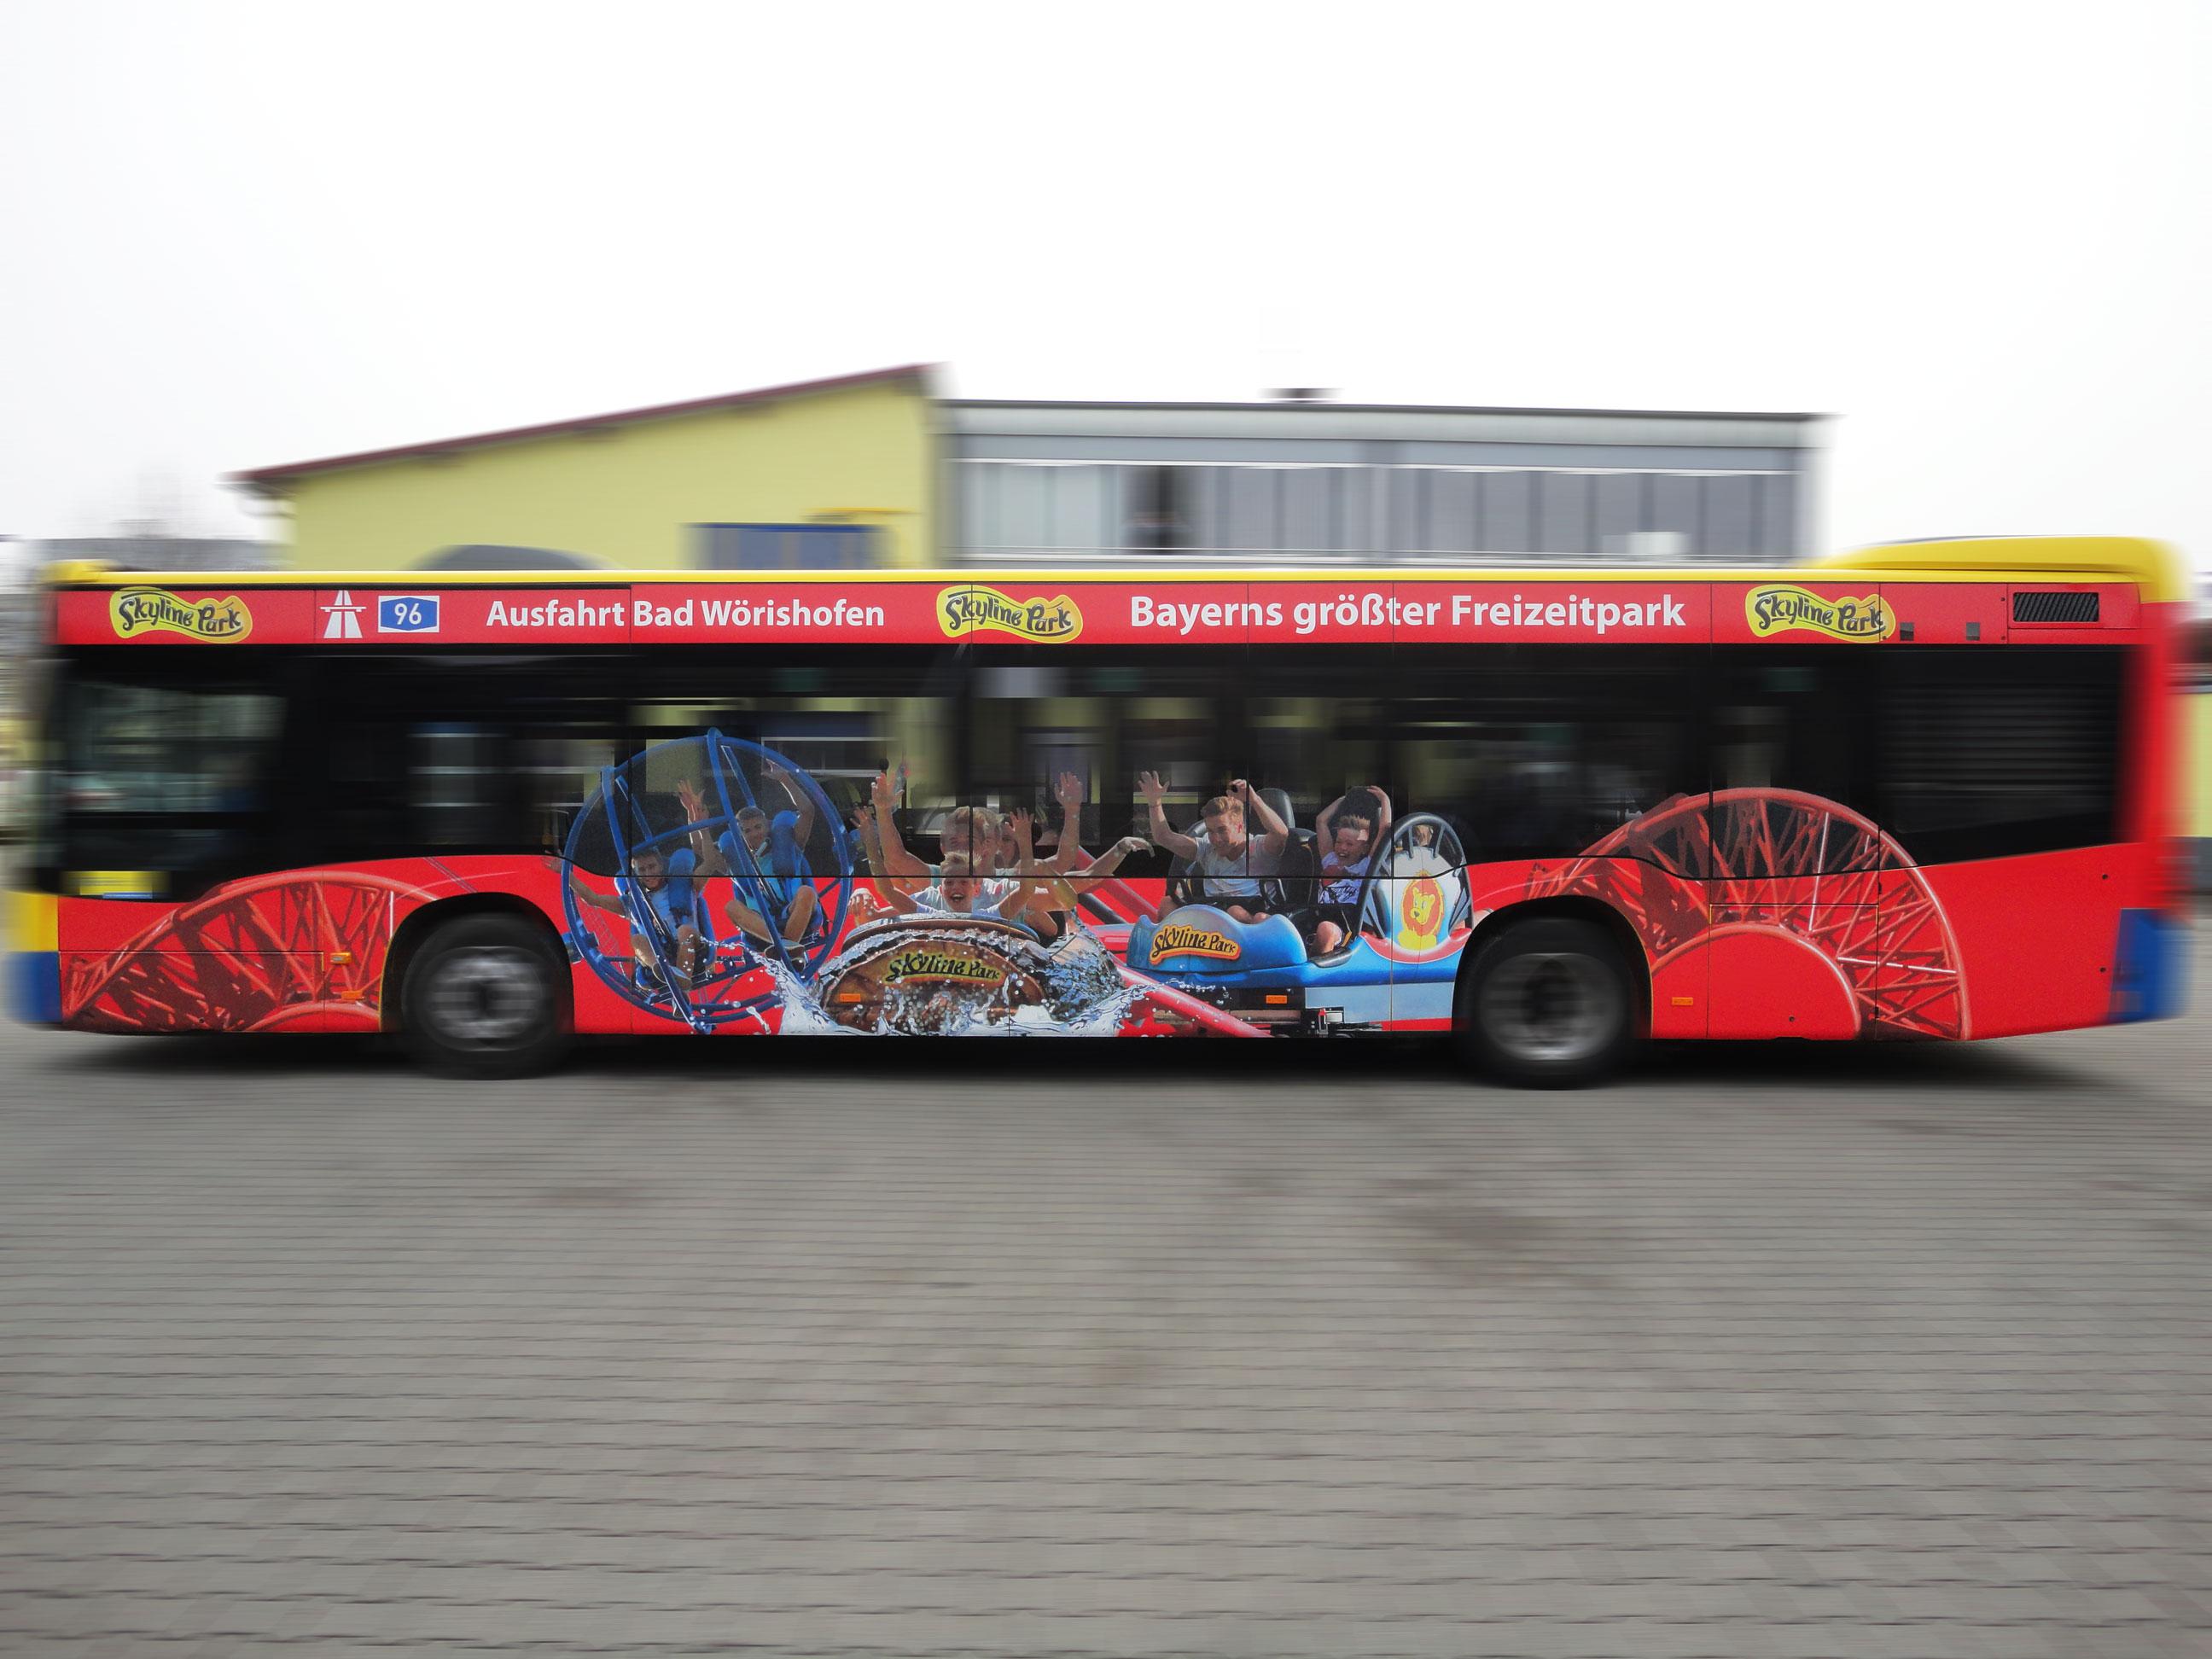 Skylinepark • Buswerbung Nürnberg München Rosenheim etc.